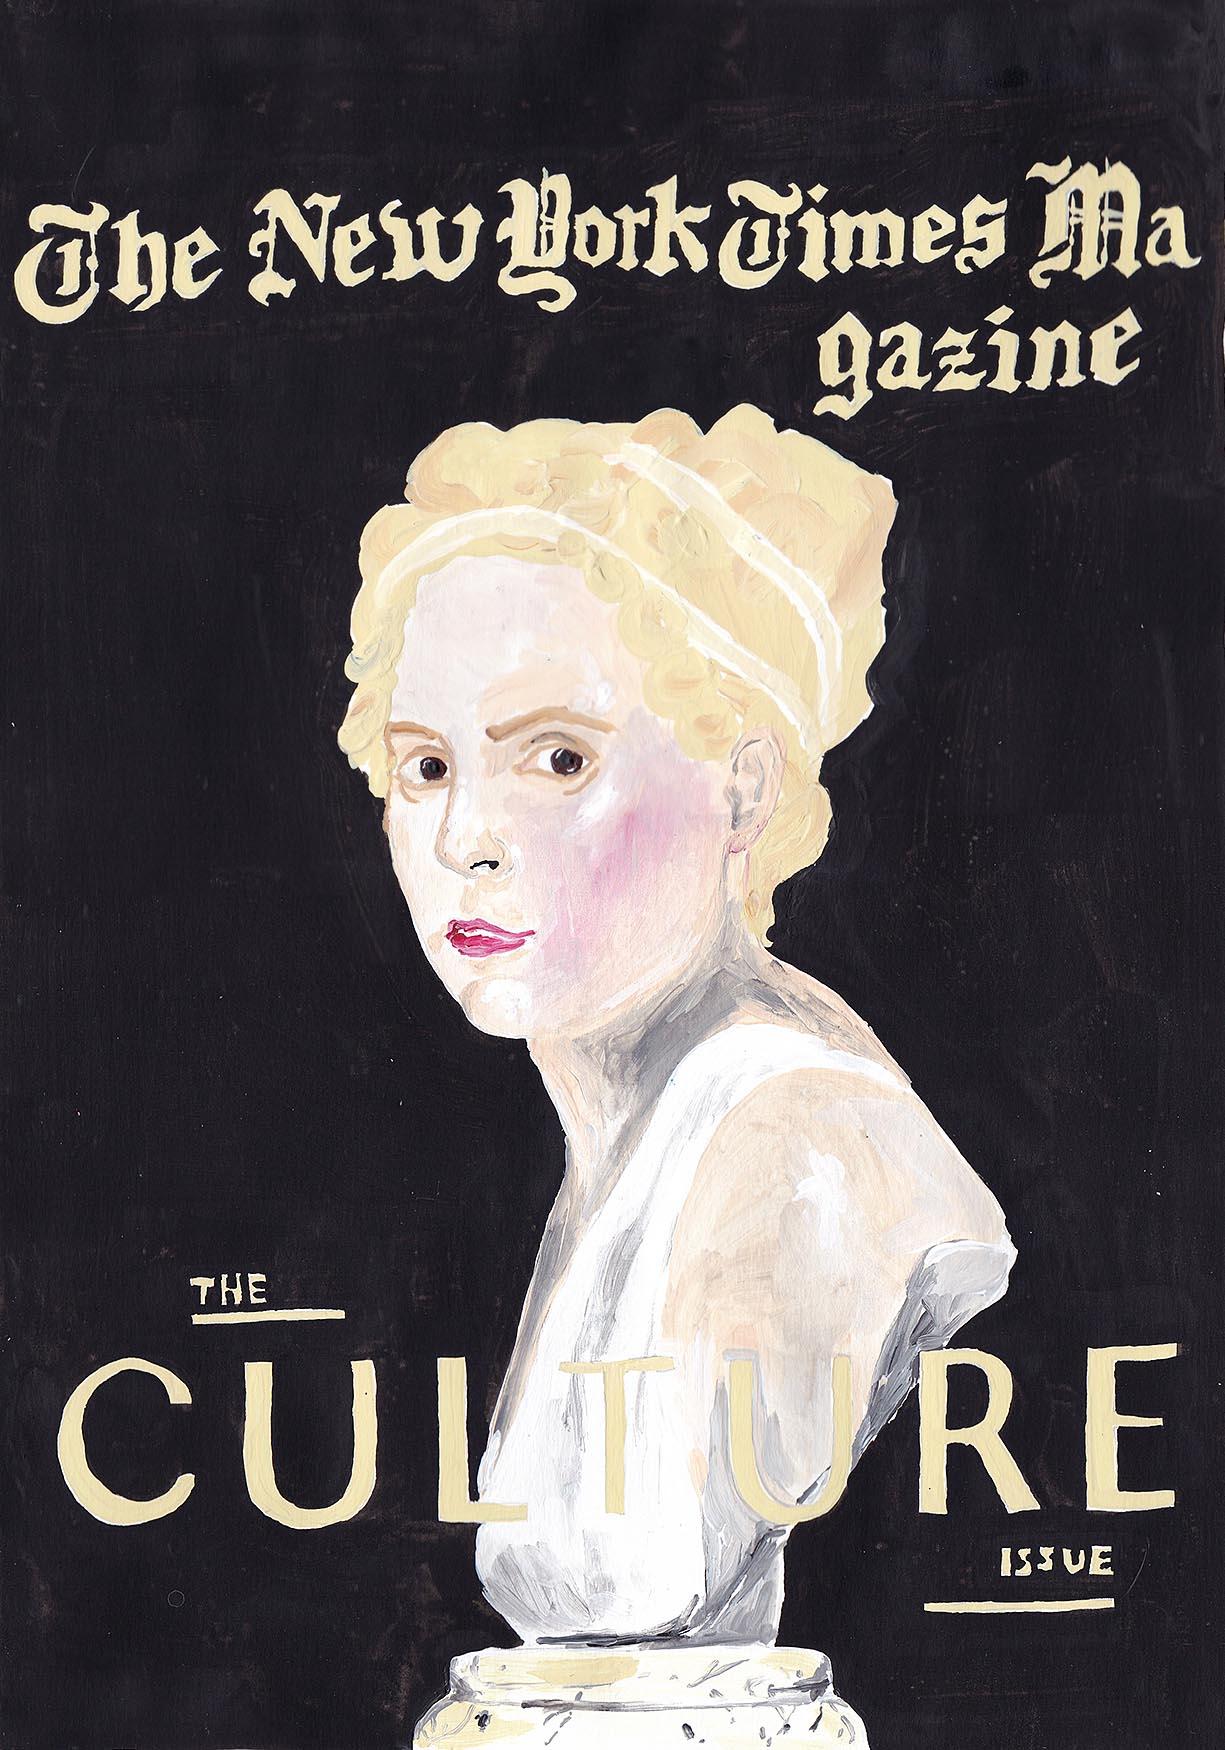 The NYT magazine, Lena Dunham